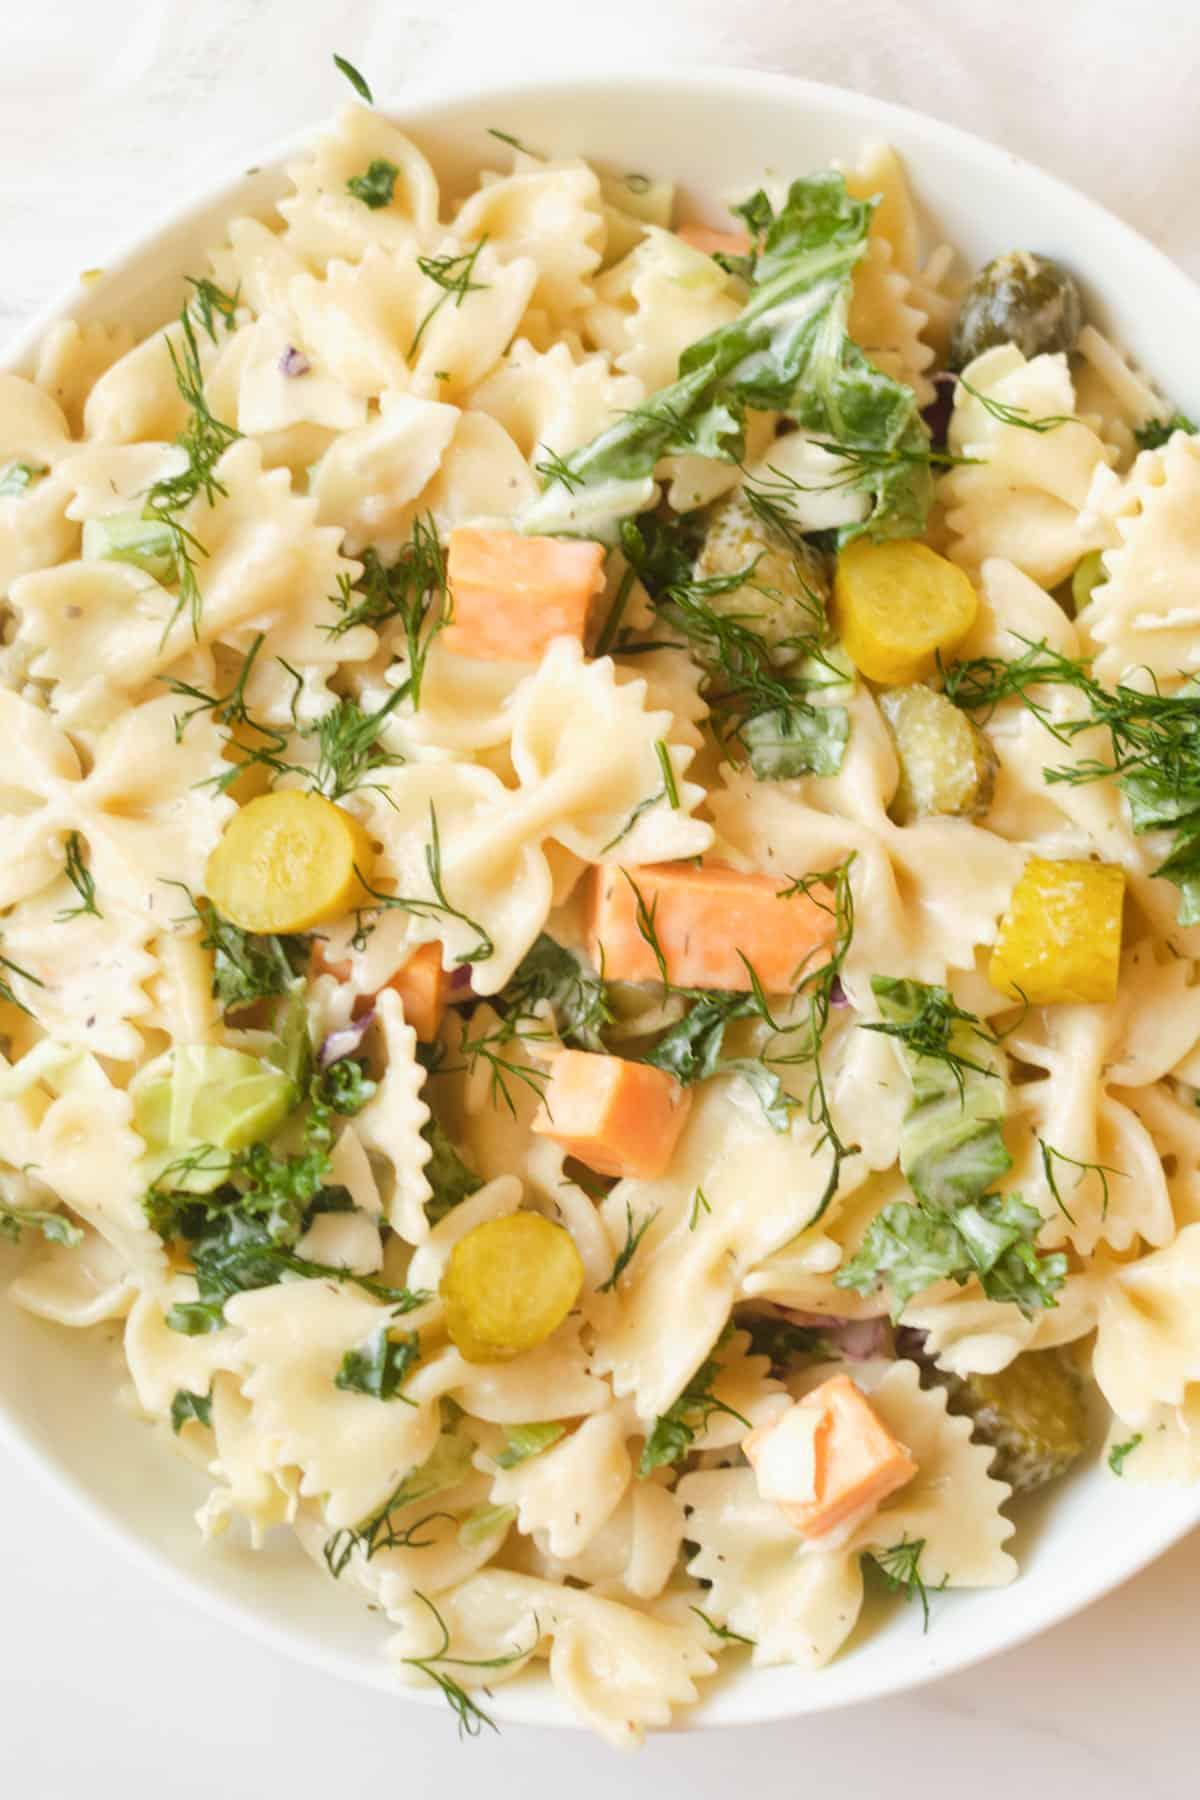 Close up of a bowl of pasta salad.